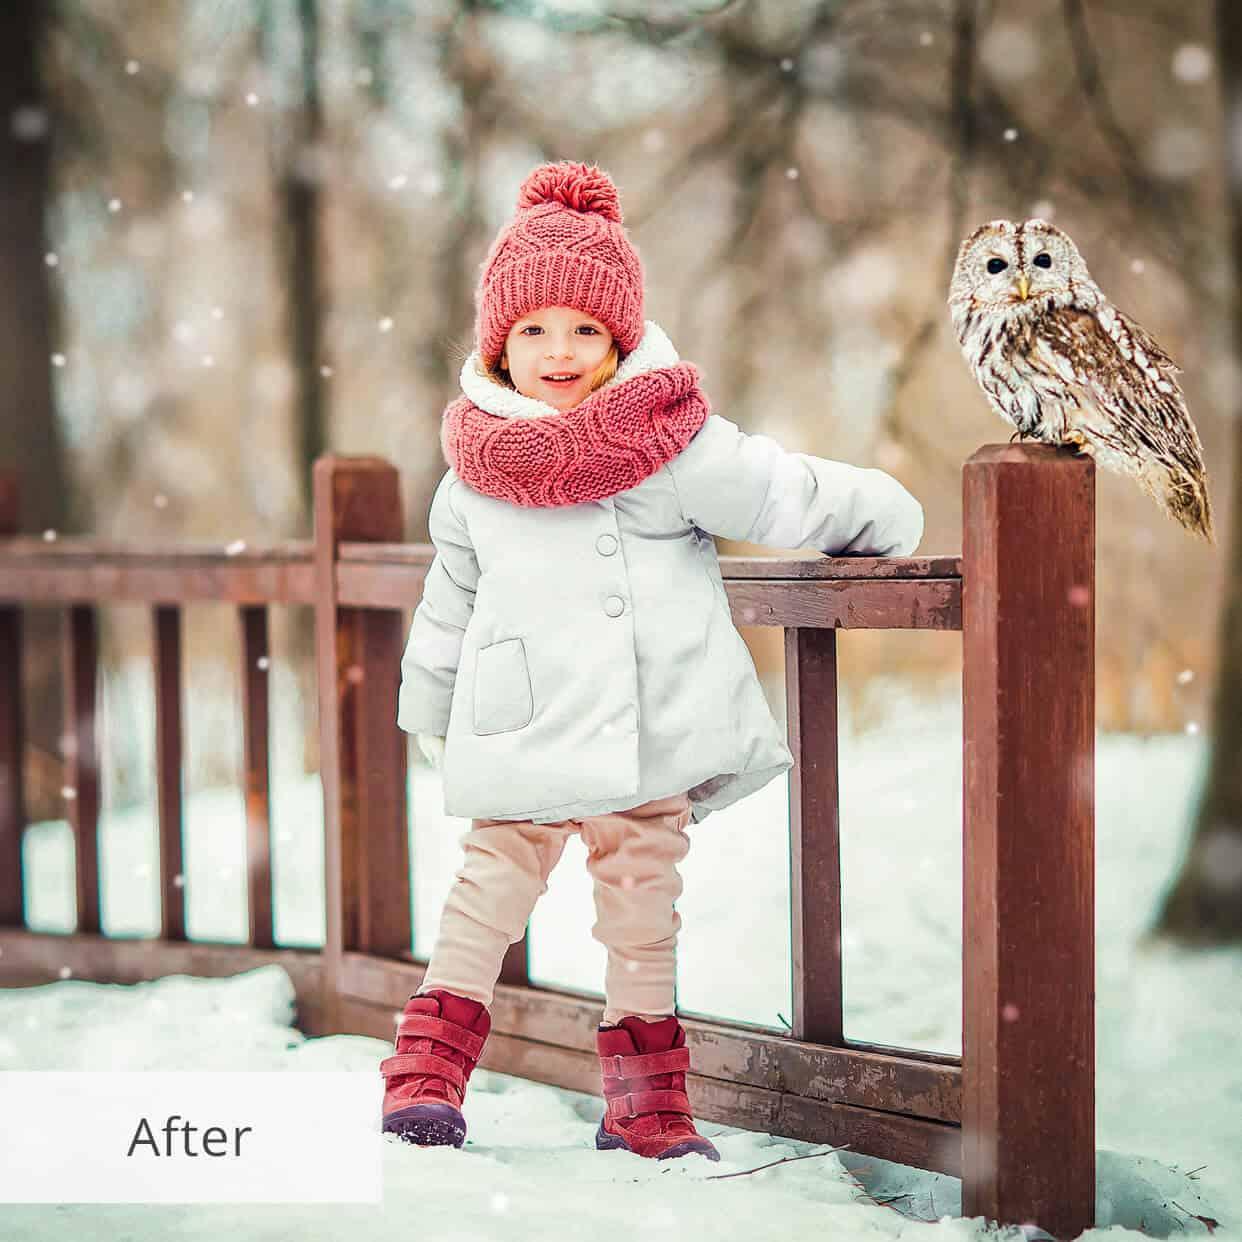 Preset Snow Dark for lightroom